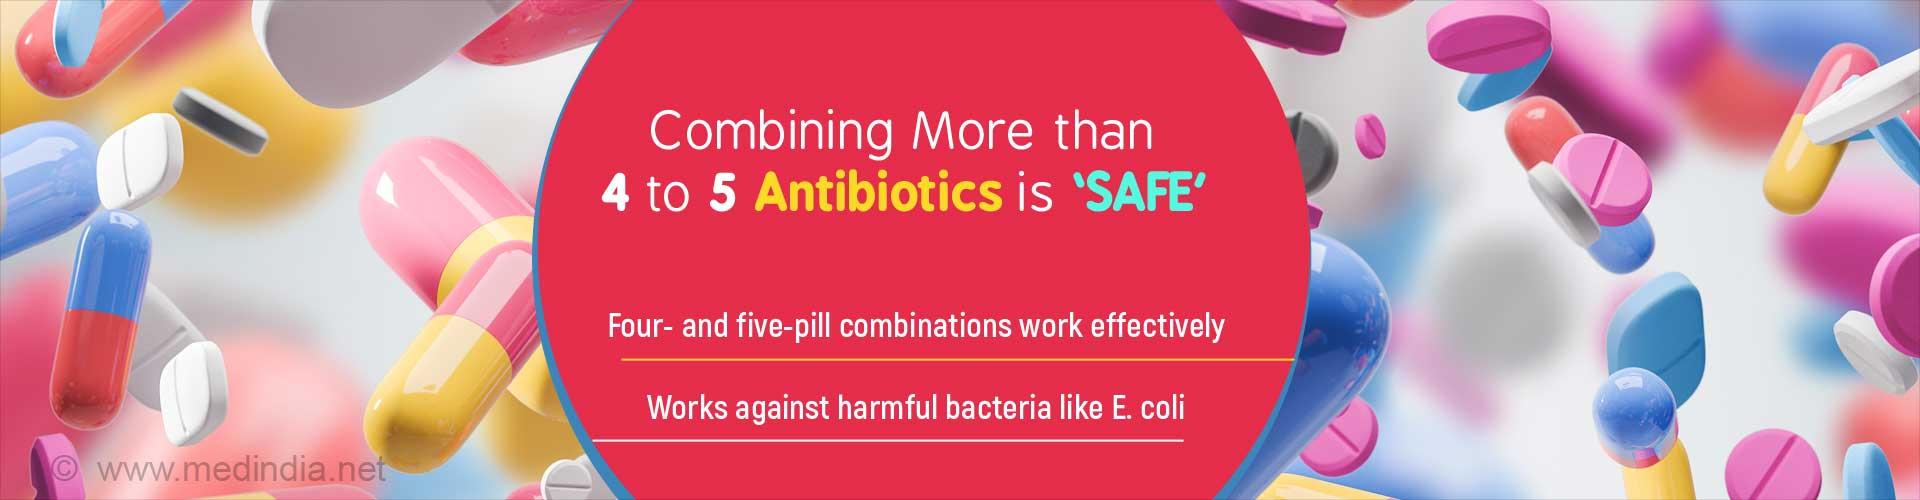 Combining 4 to 5 Antibiotics can Help Kill Harmful Bacteria